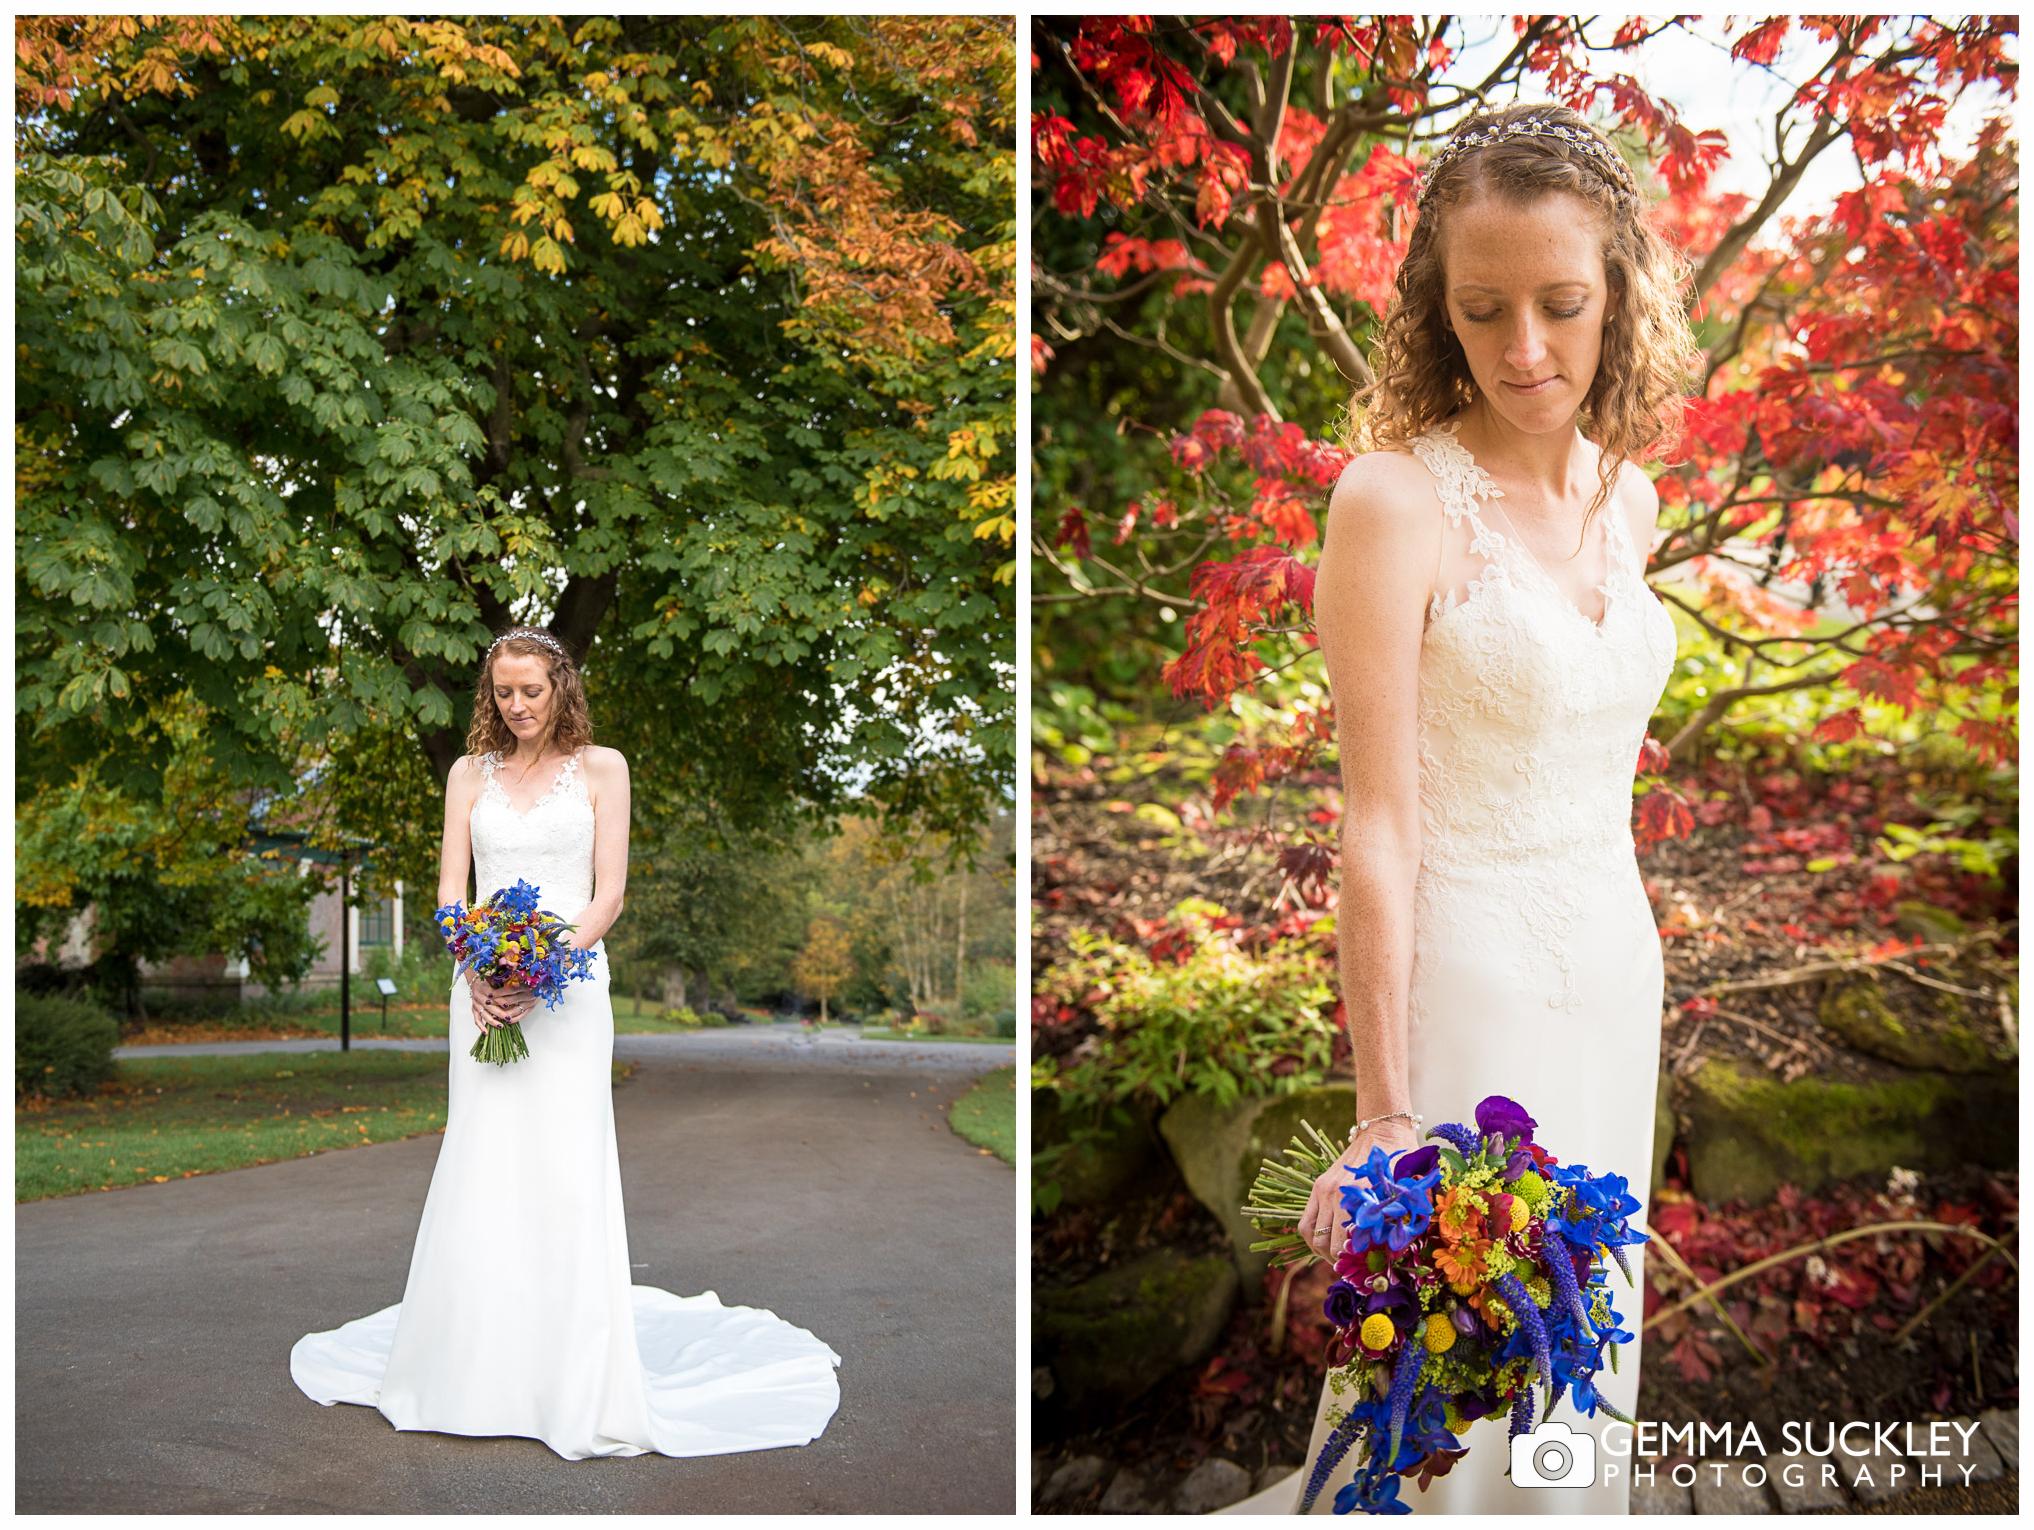 Autumn wedding photography in Valley Garden's in Harrogate